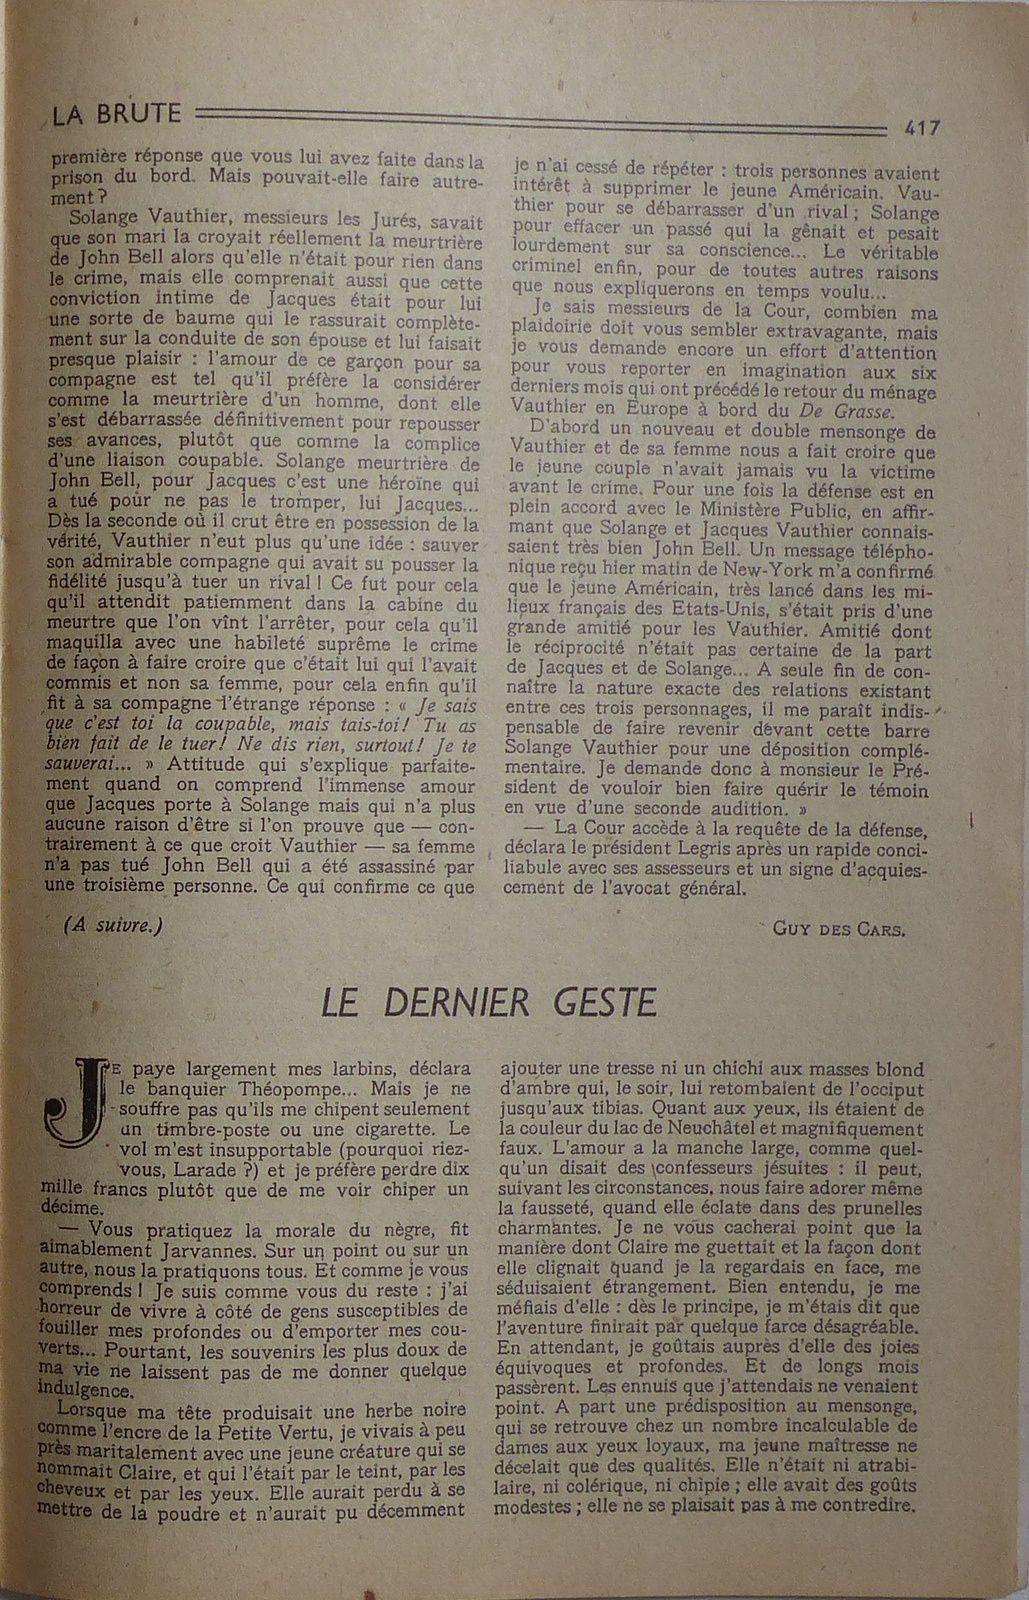 "J.-H. Rosny aîné ""Le Dernier geste"" in Lisez-Moi n°164 (1952)"